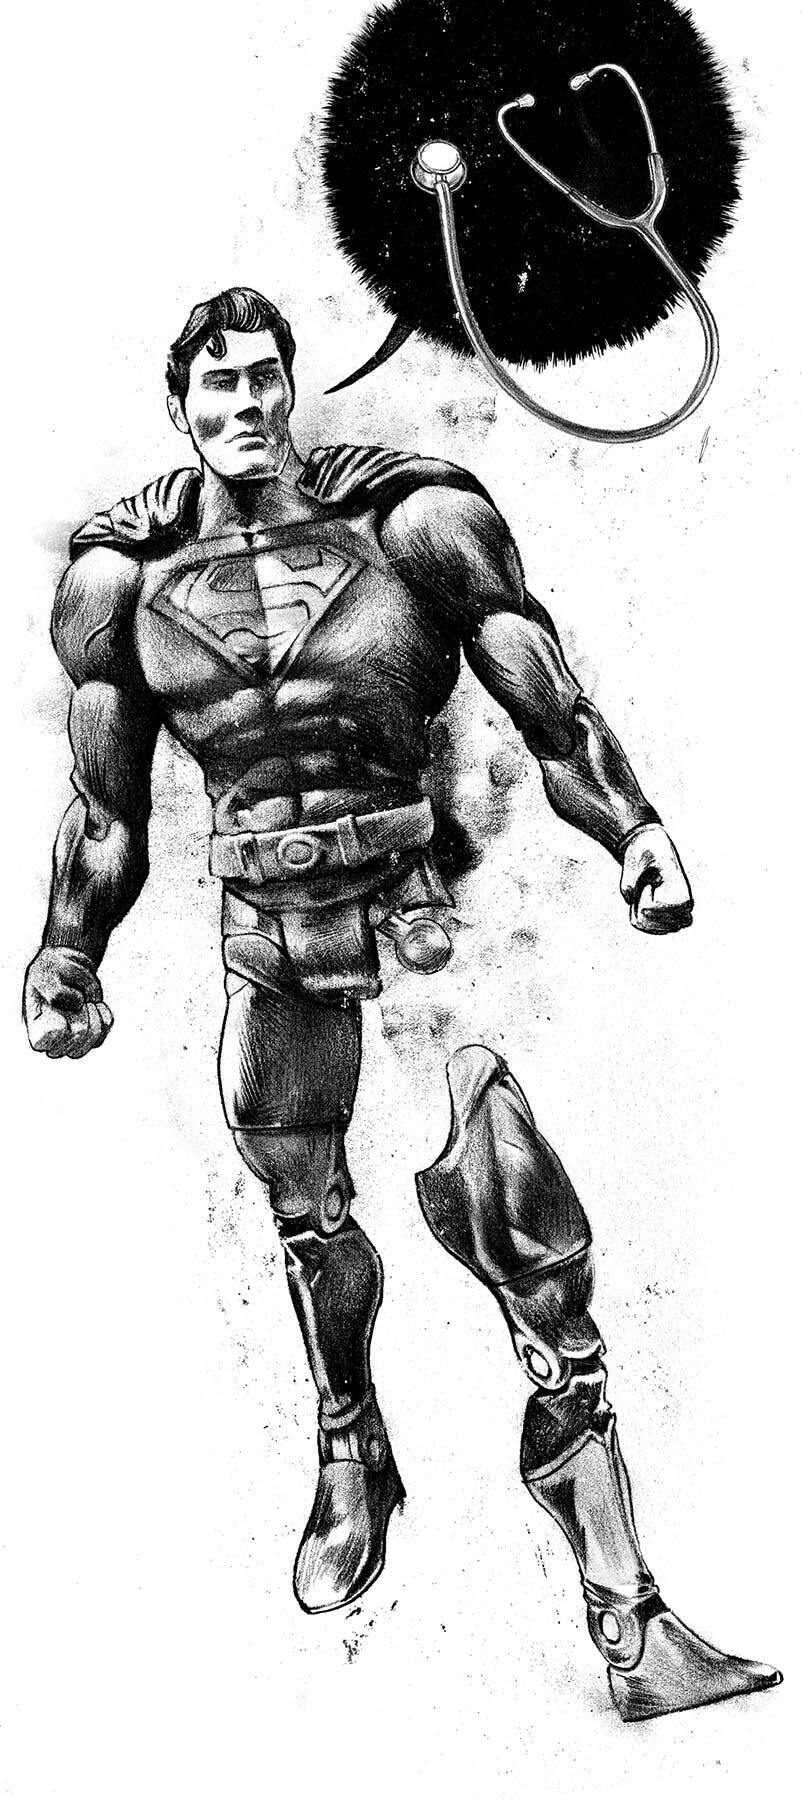 Broken Superman figure masculine doctor editorial illustration - Kornel Illustration | Kornel Stadler portfolio